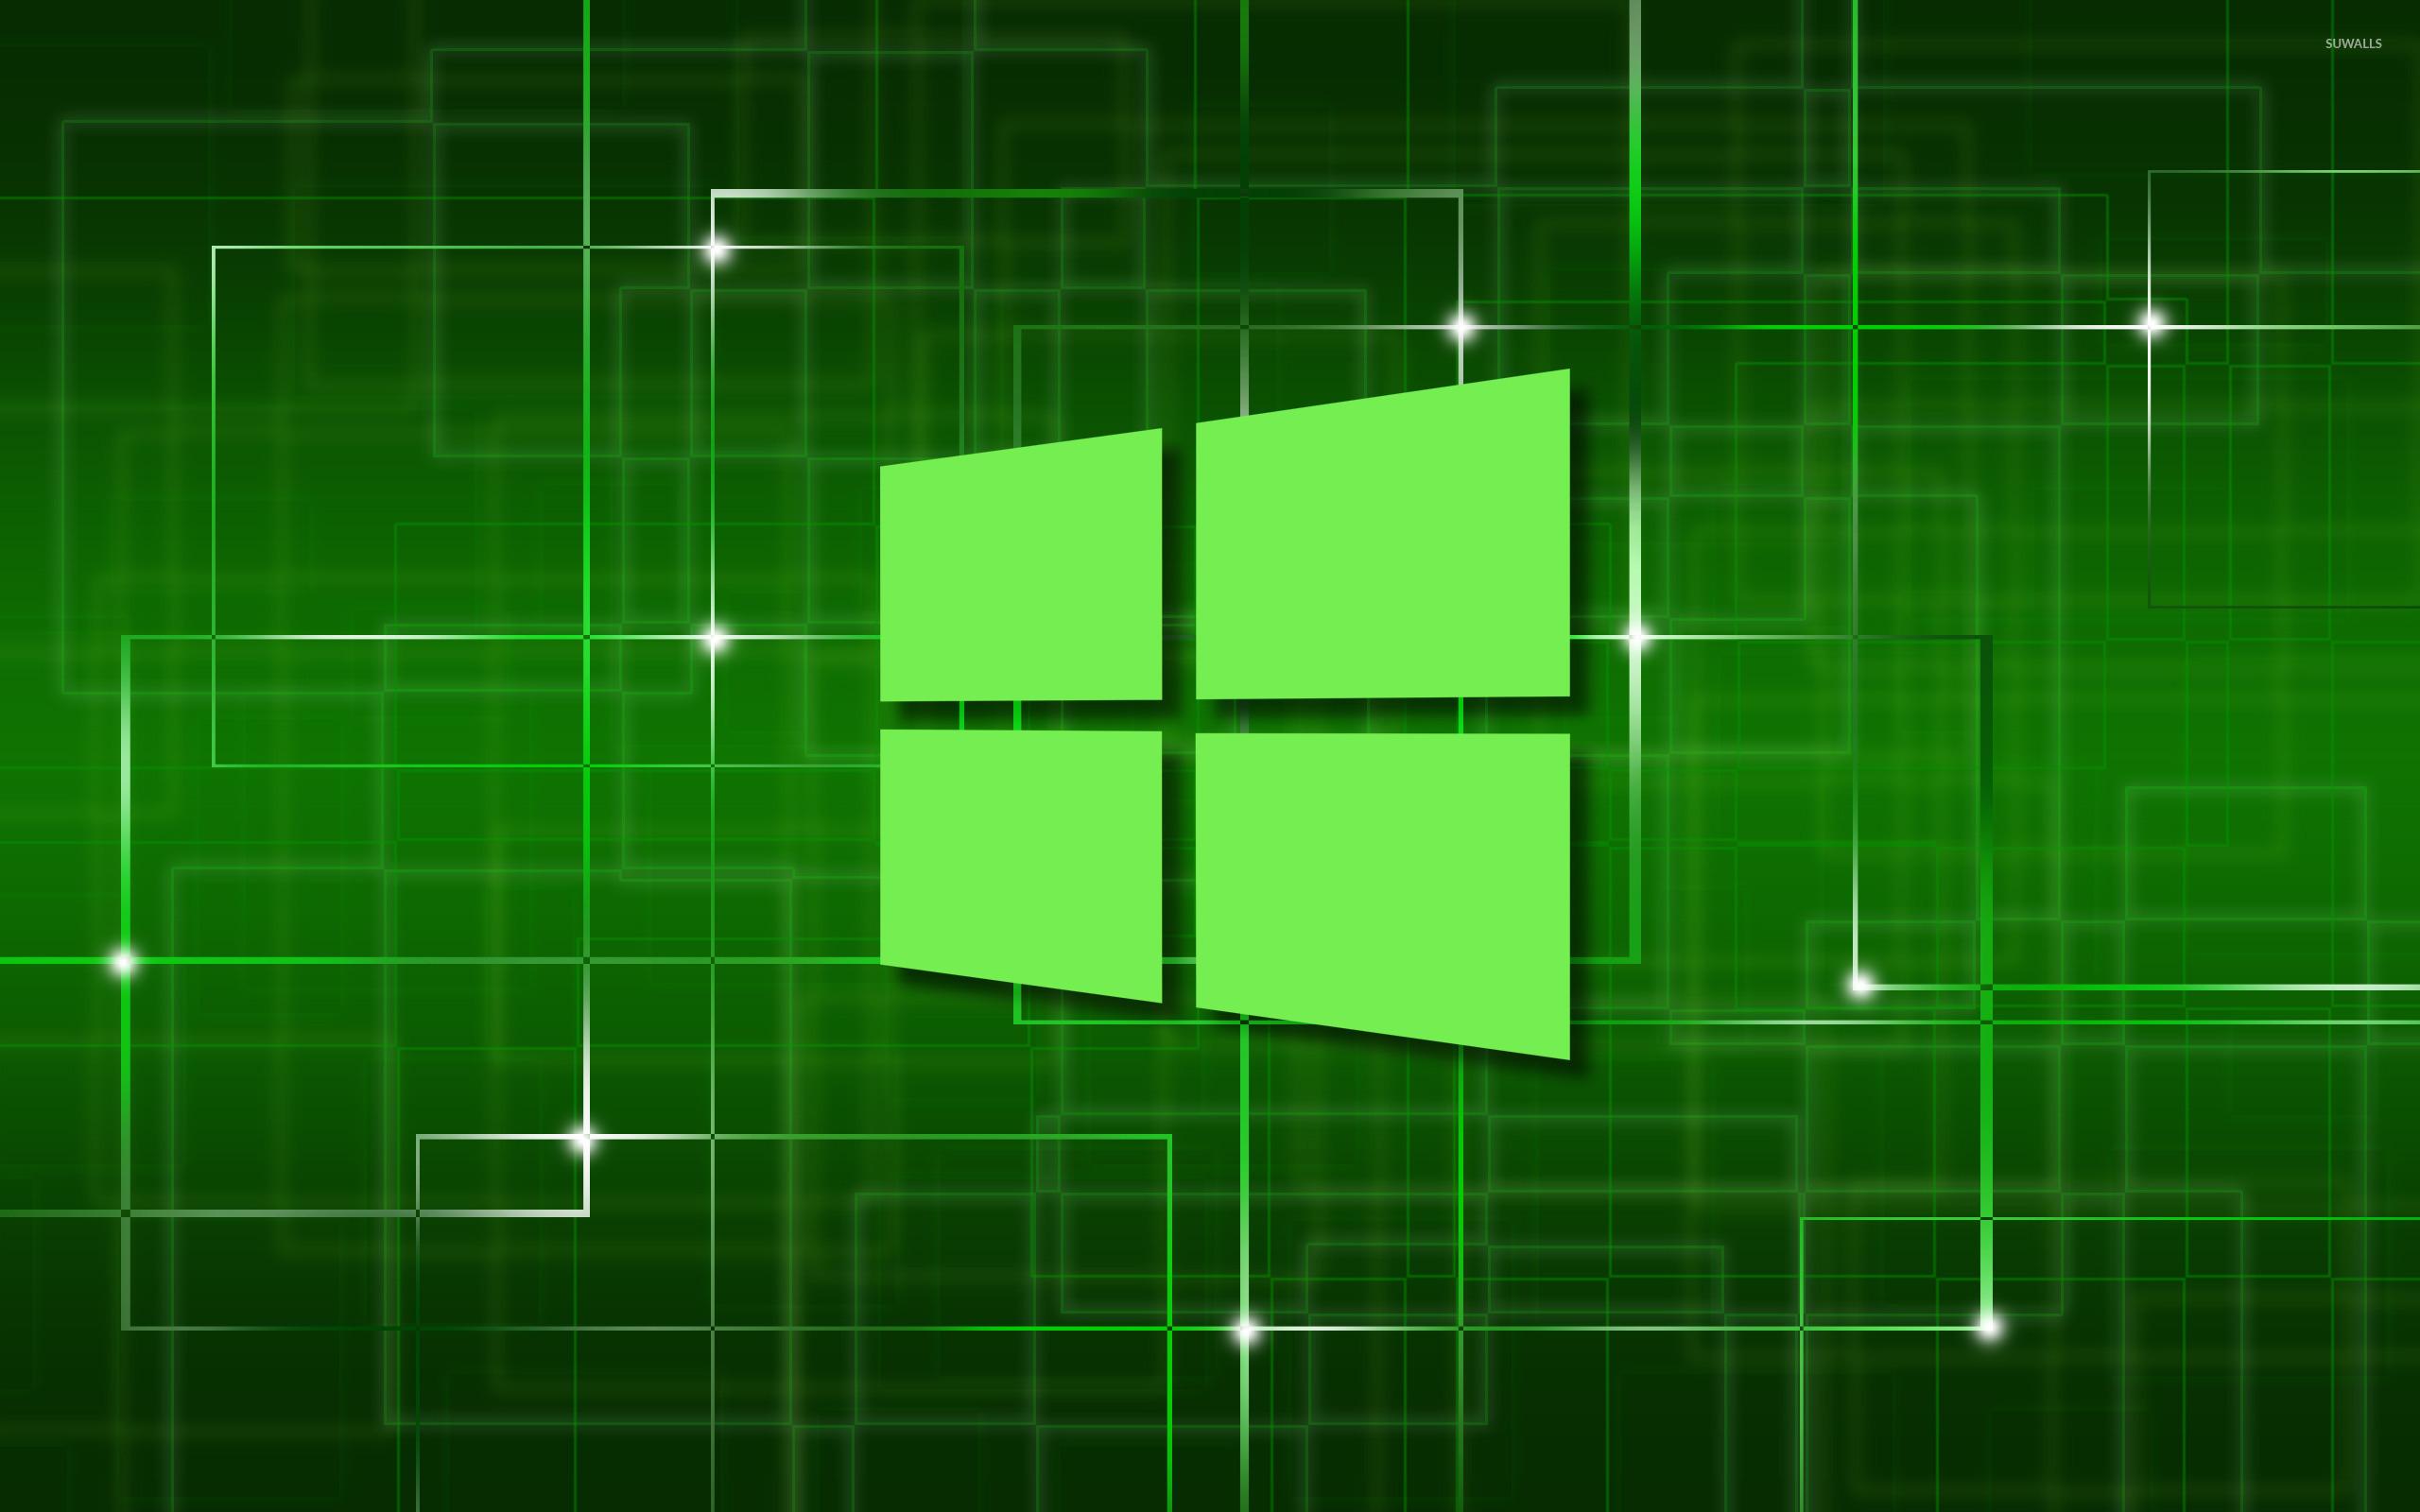 Windows 10 Wallpaper 1680x1050